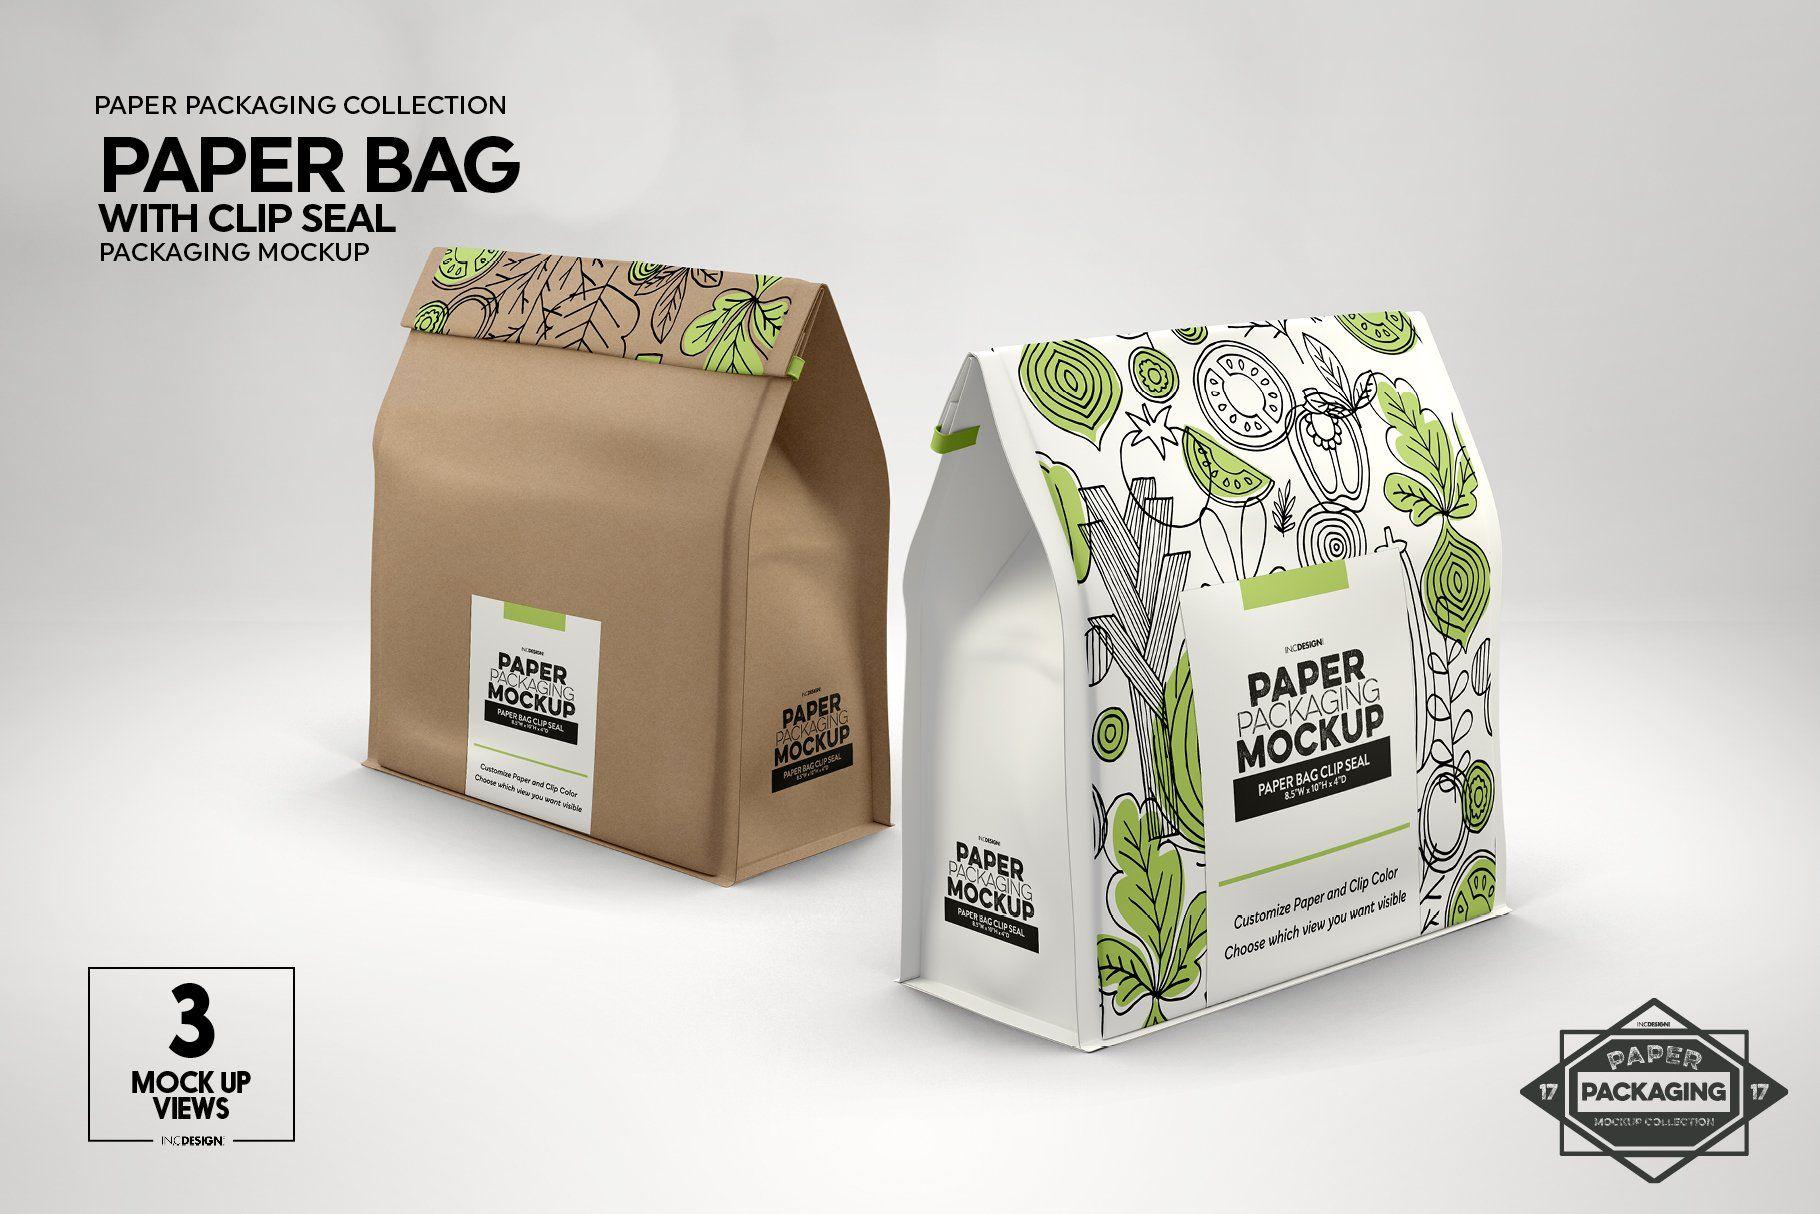 Download Paper Bags With Clip Seals Packaging Mockup 338560 Branding Design Bundles Packaging Mockup Free Packaging Mockup Paper Bag